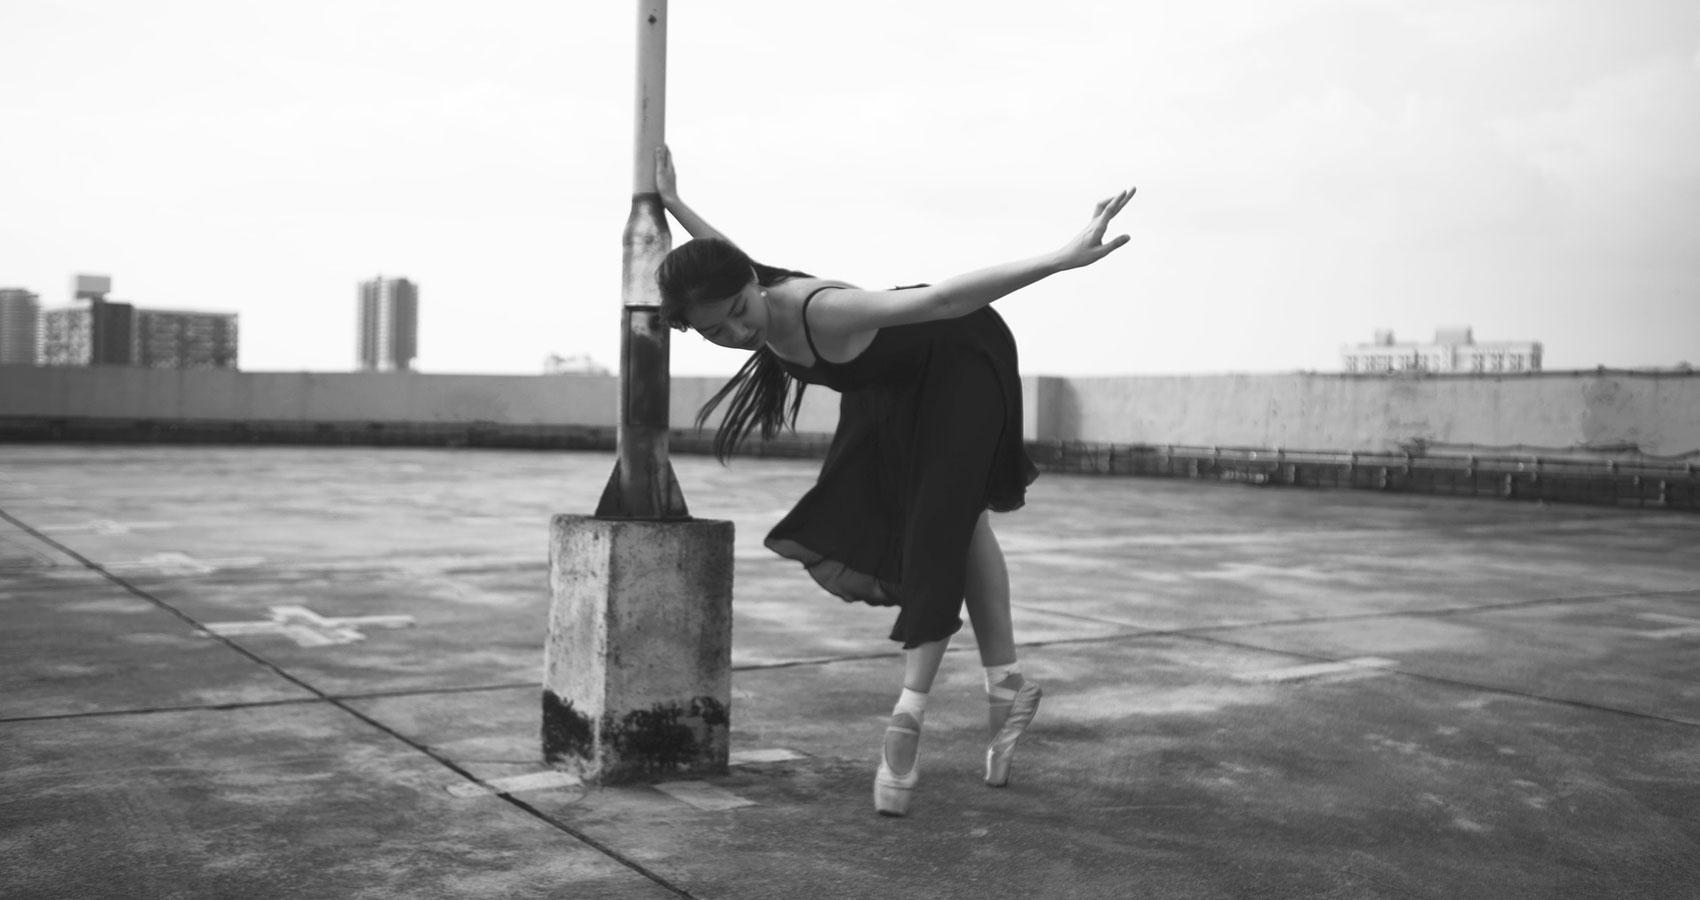 My Dizzy Dance, poetry written by Baidha Fercoq at Spilwords.com